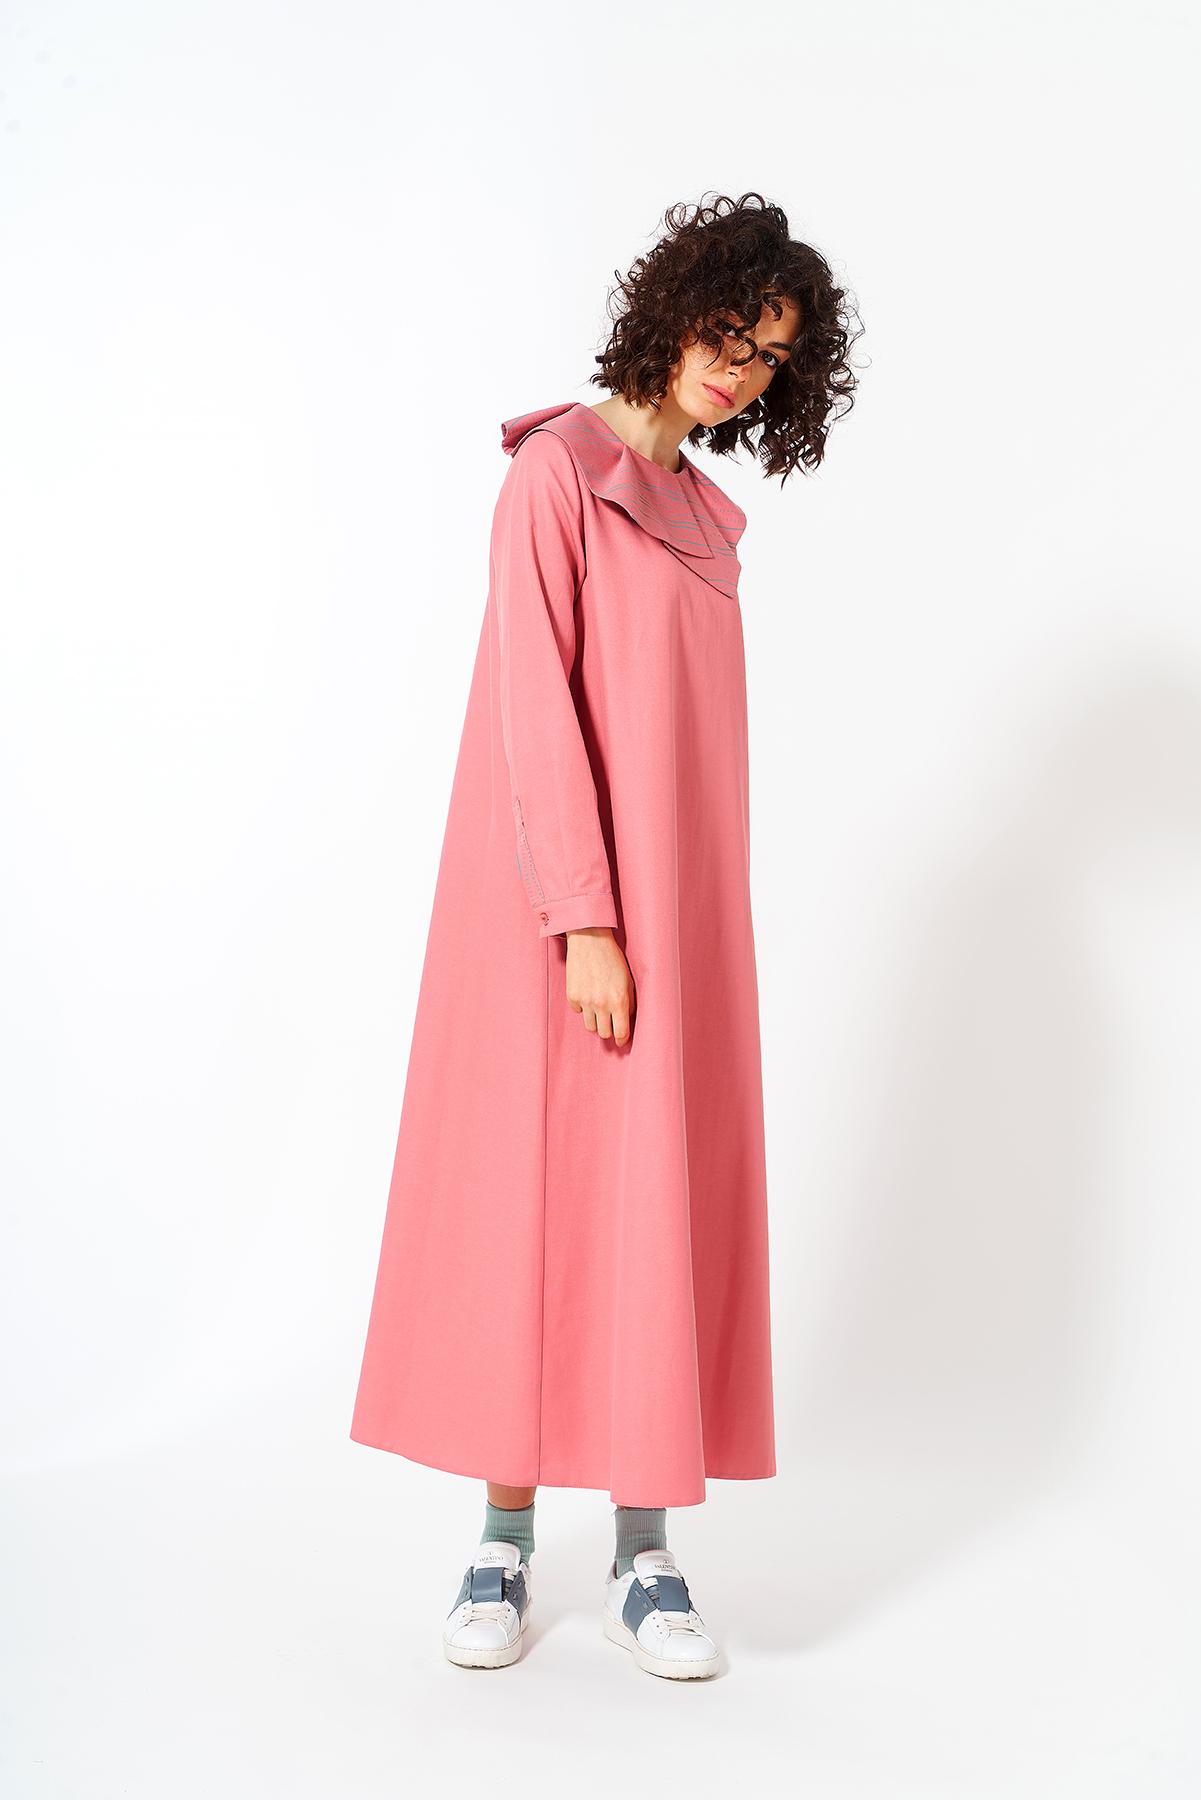 Mevra - Yaka Detay Elbise Pudra